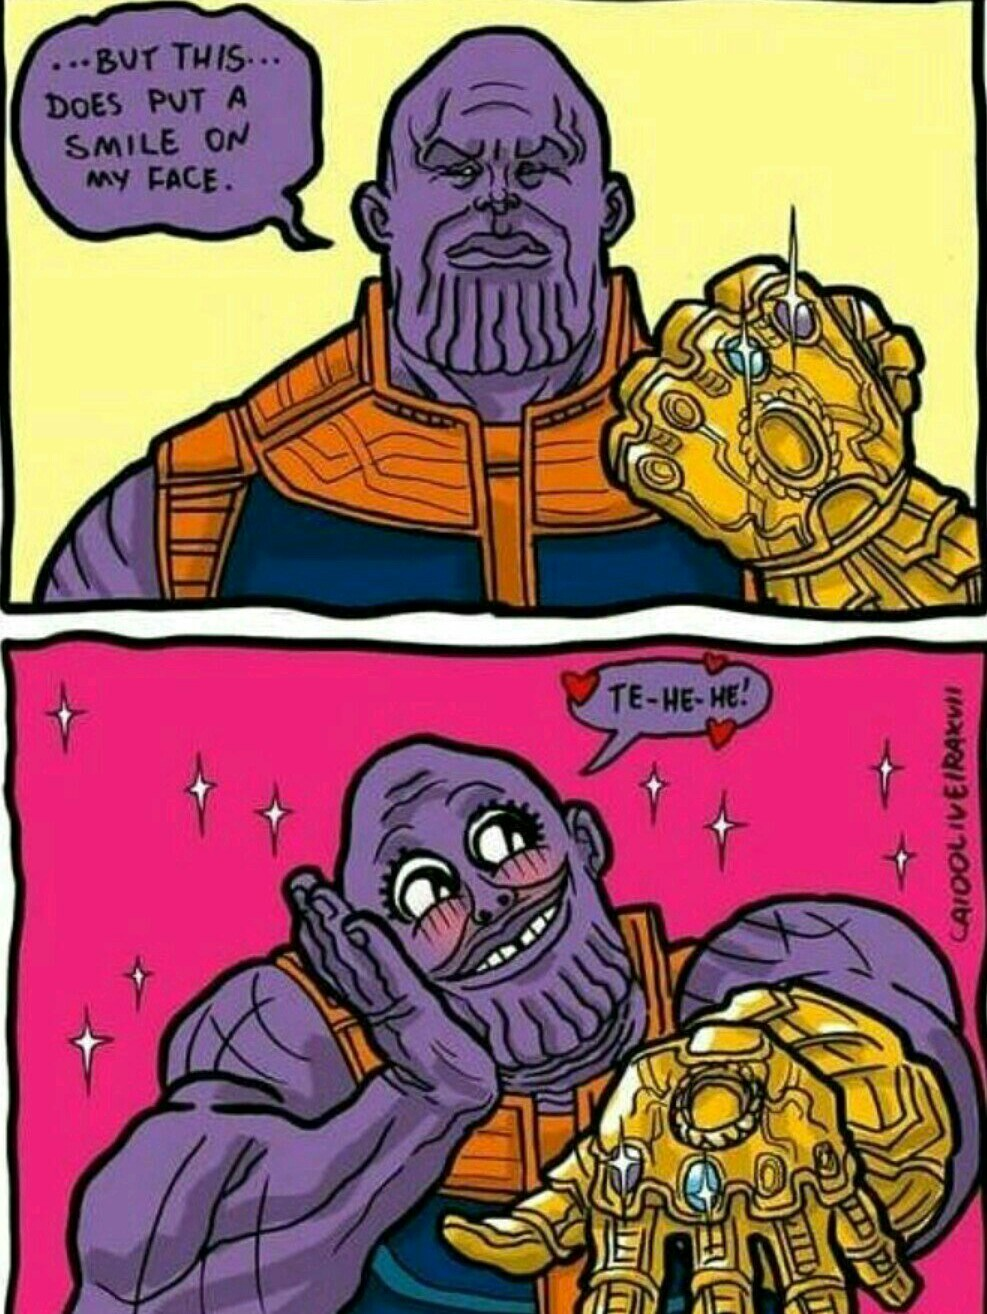 Thanos sugoi kawaii(n leia a tag) - meme